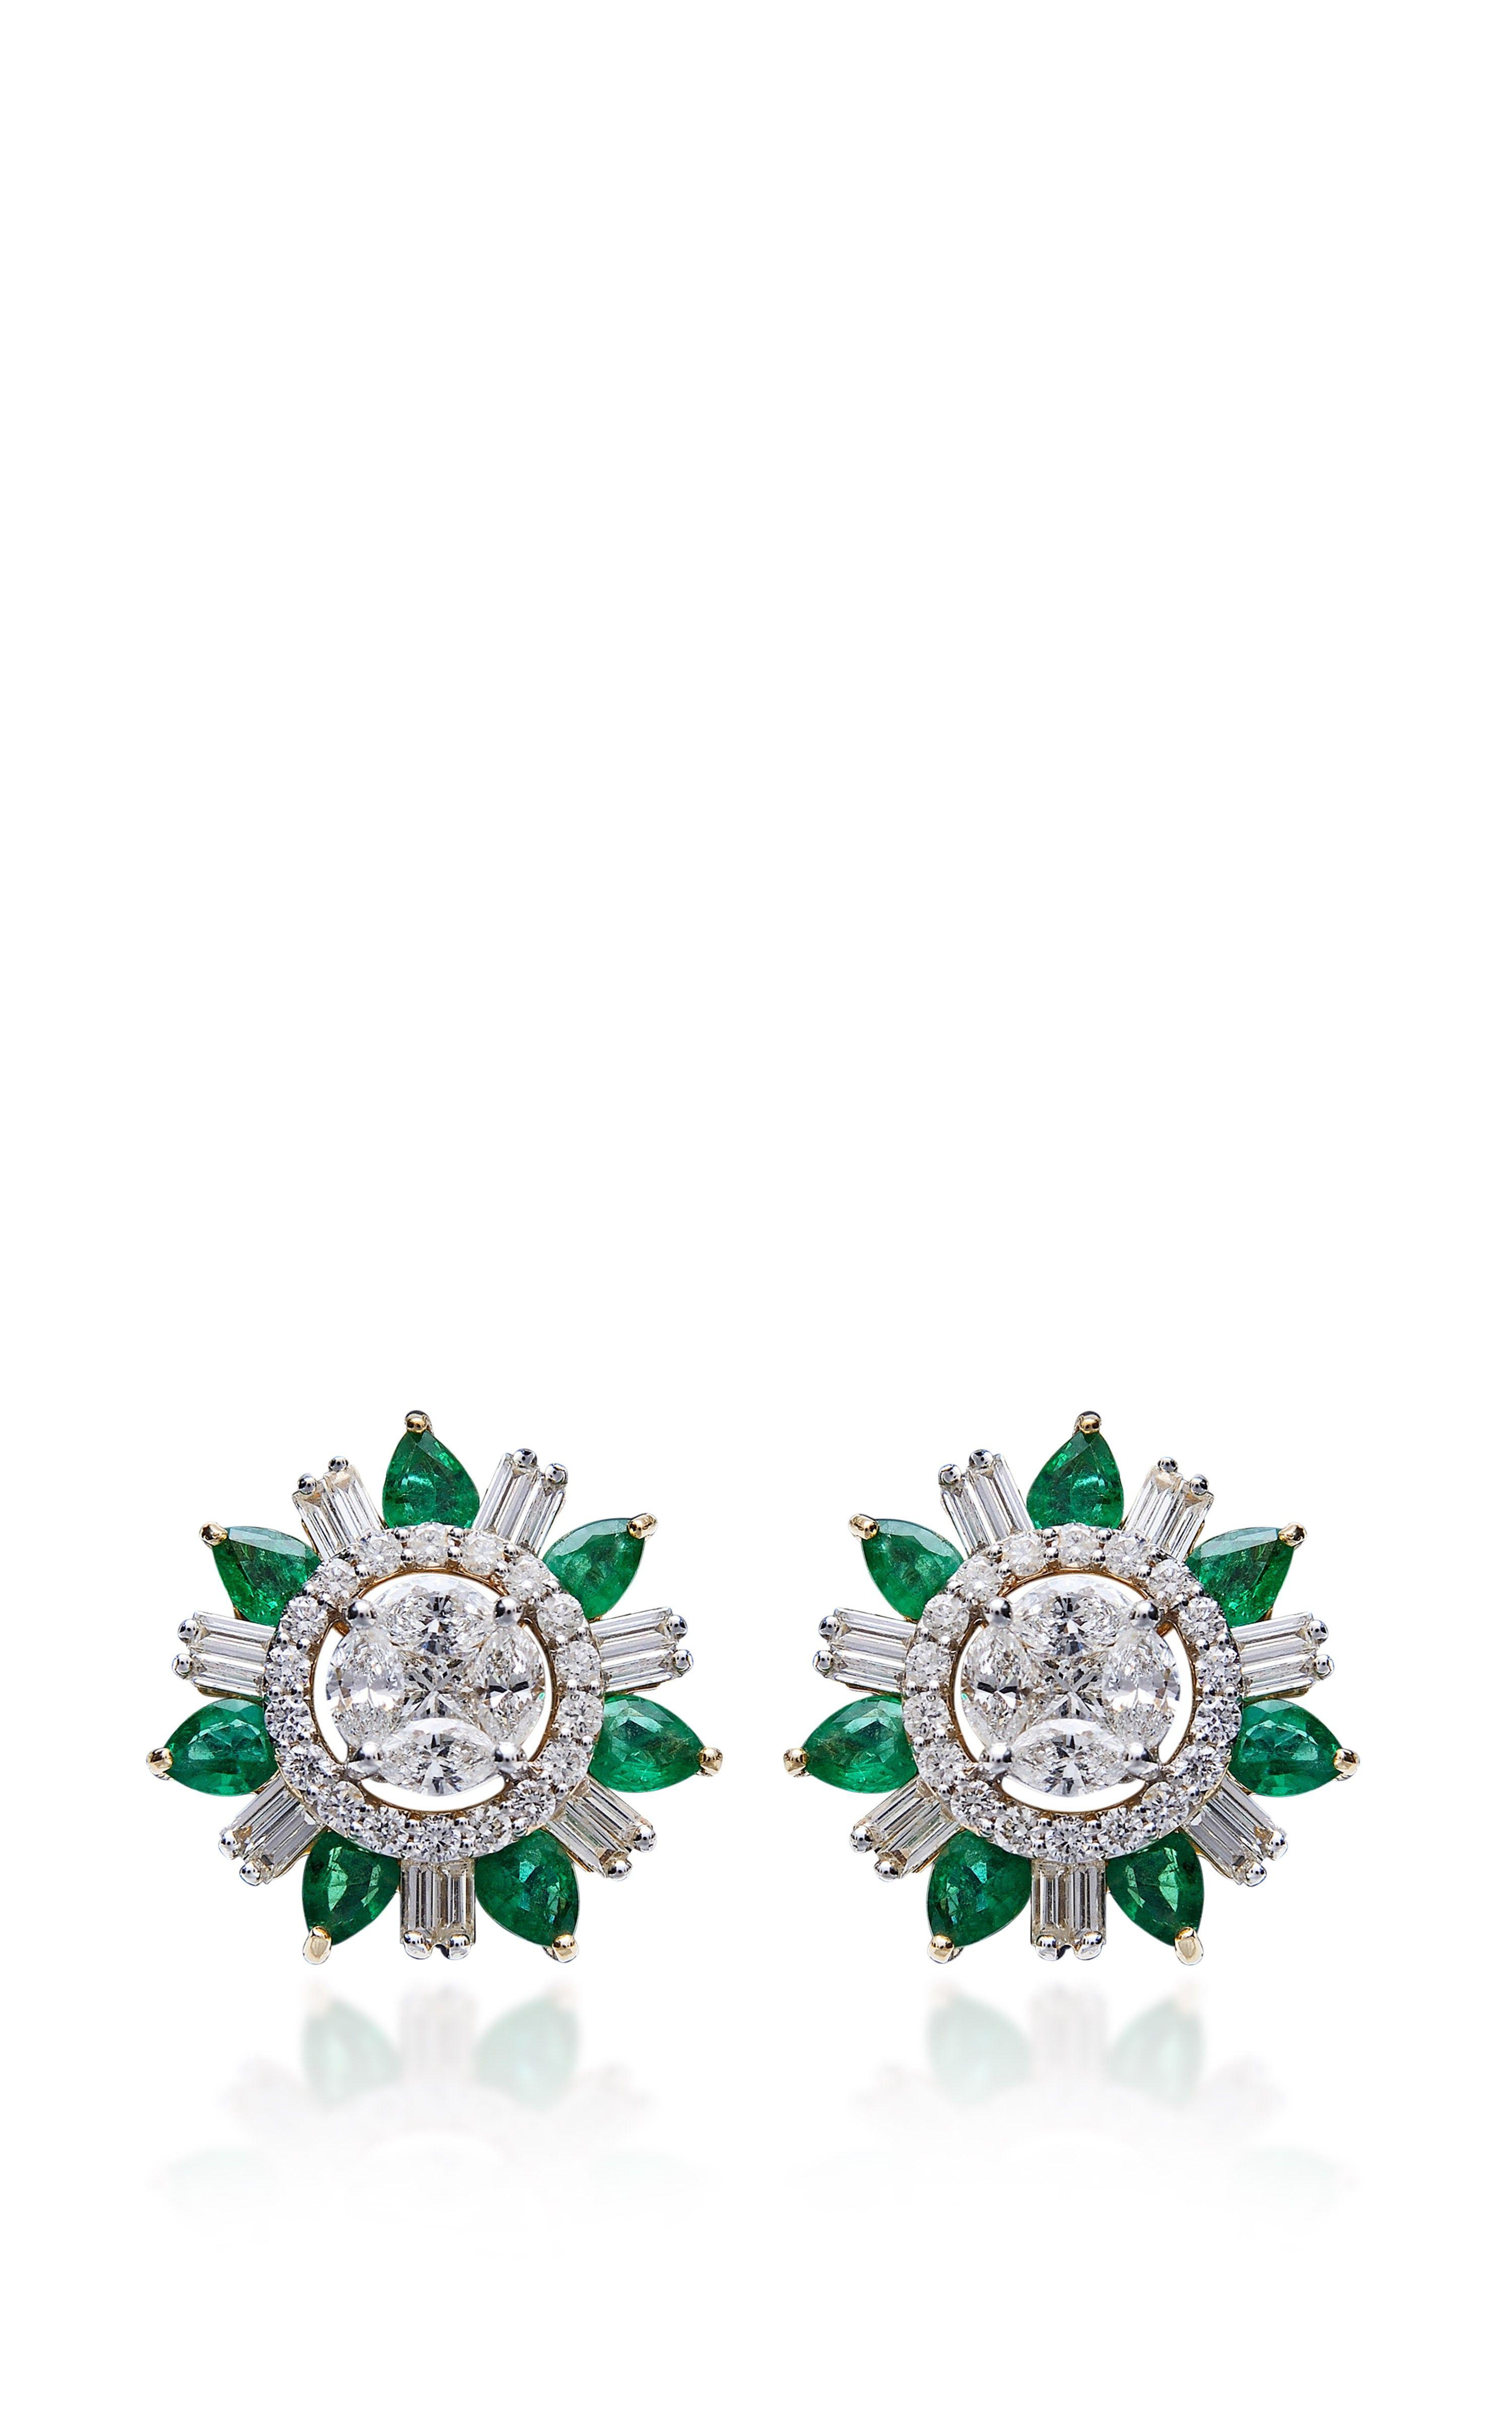 Emerald And Diamond Stud Earrings by Farah Khan Fine Jewelry for